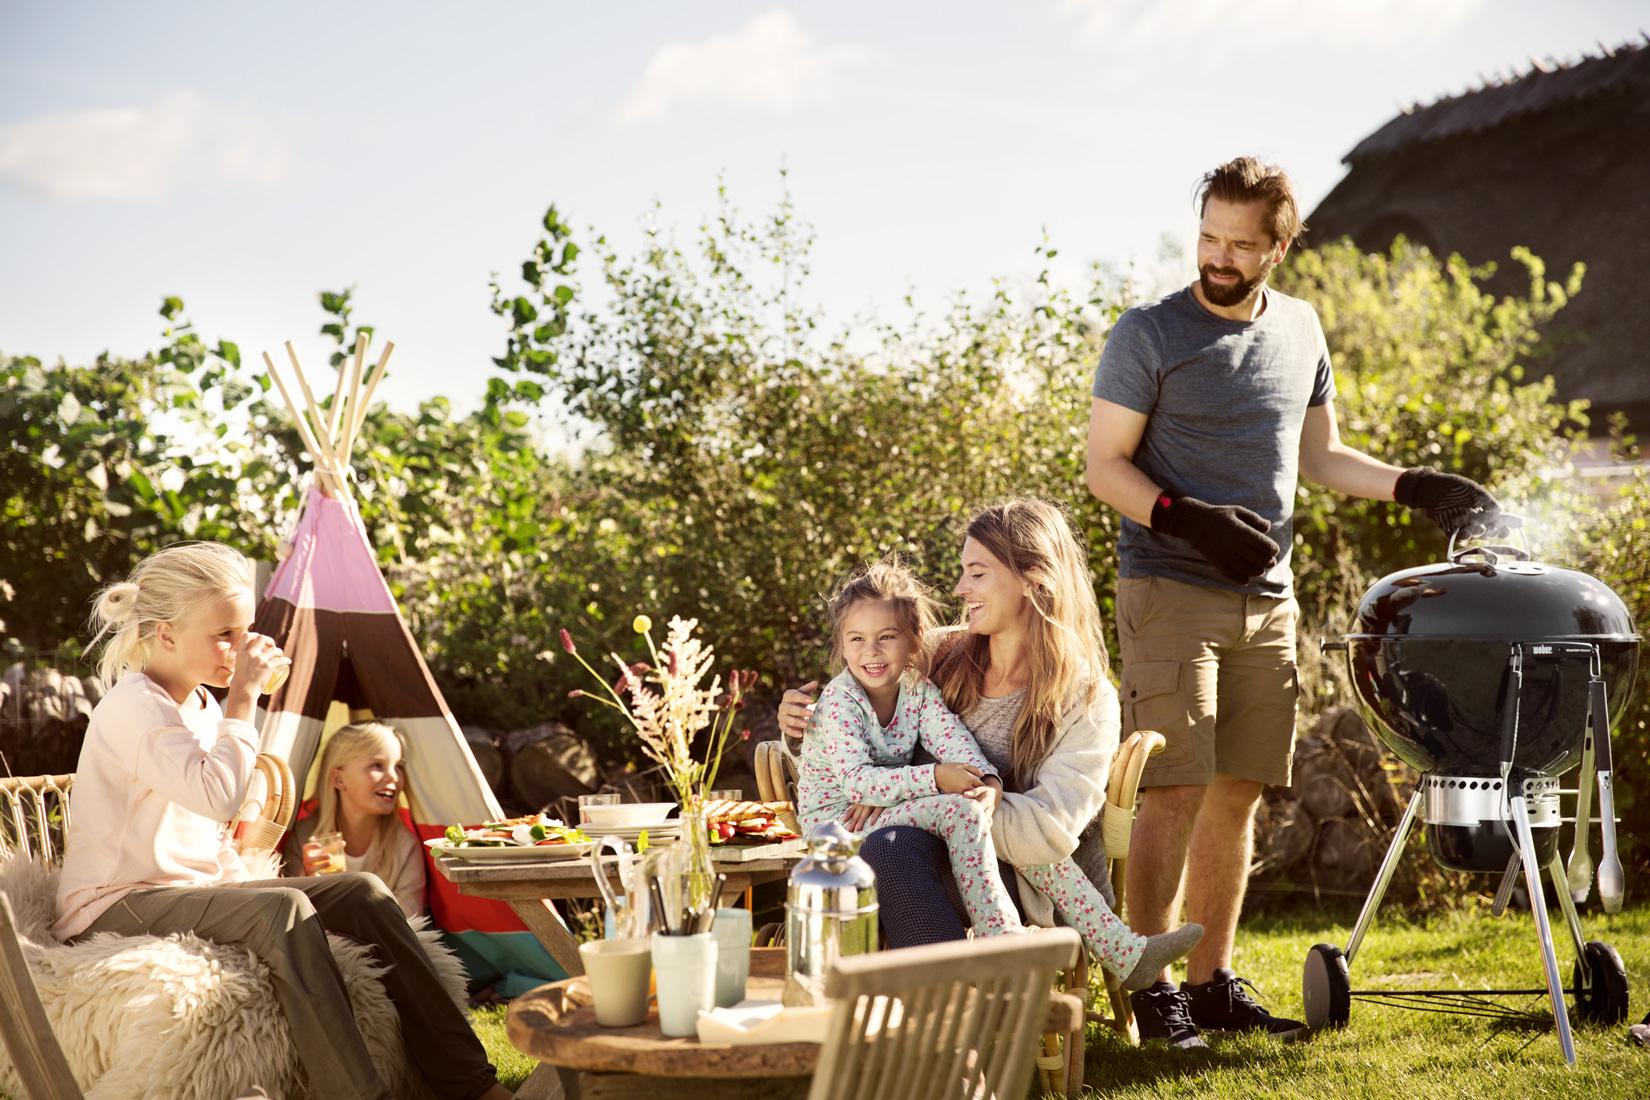 barbecue tuin gezin